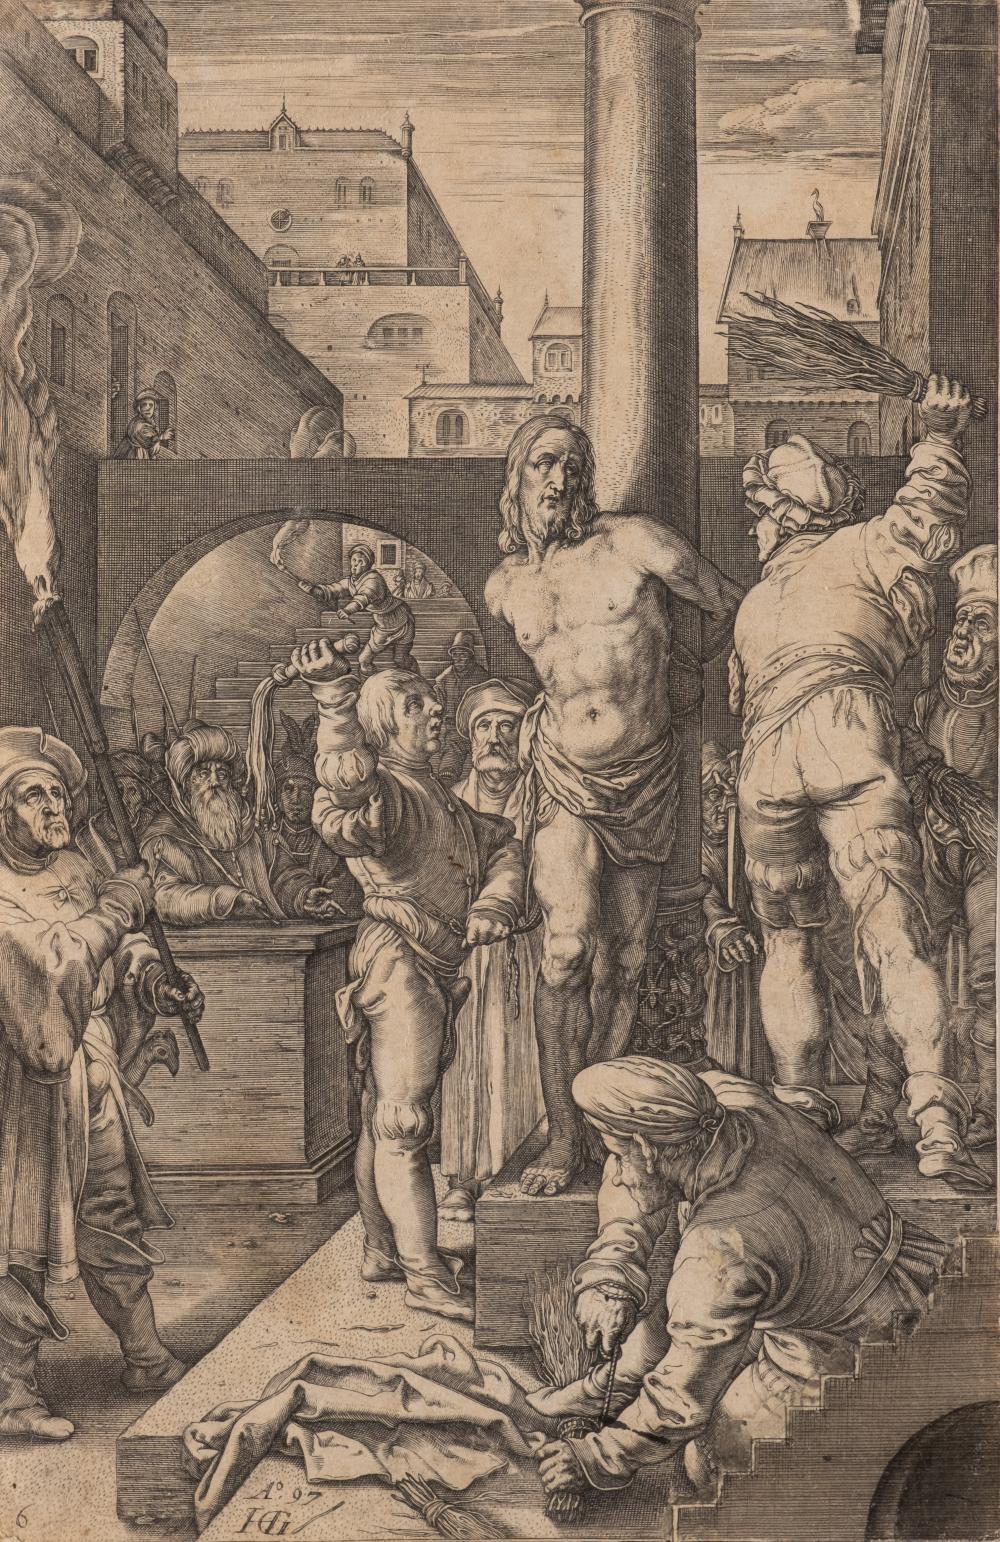 HENDRIK GOLTZIUS DUTCH ANNUNCIATION OLD ART PAINTING POSTER PRINT BB5599A